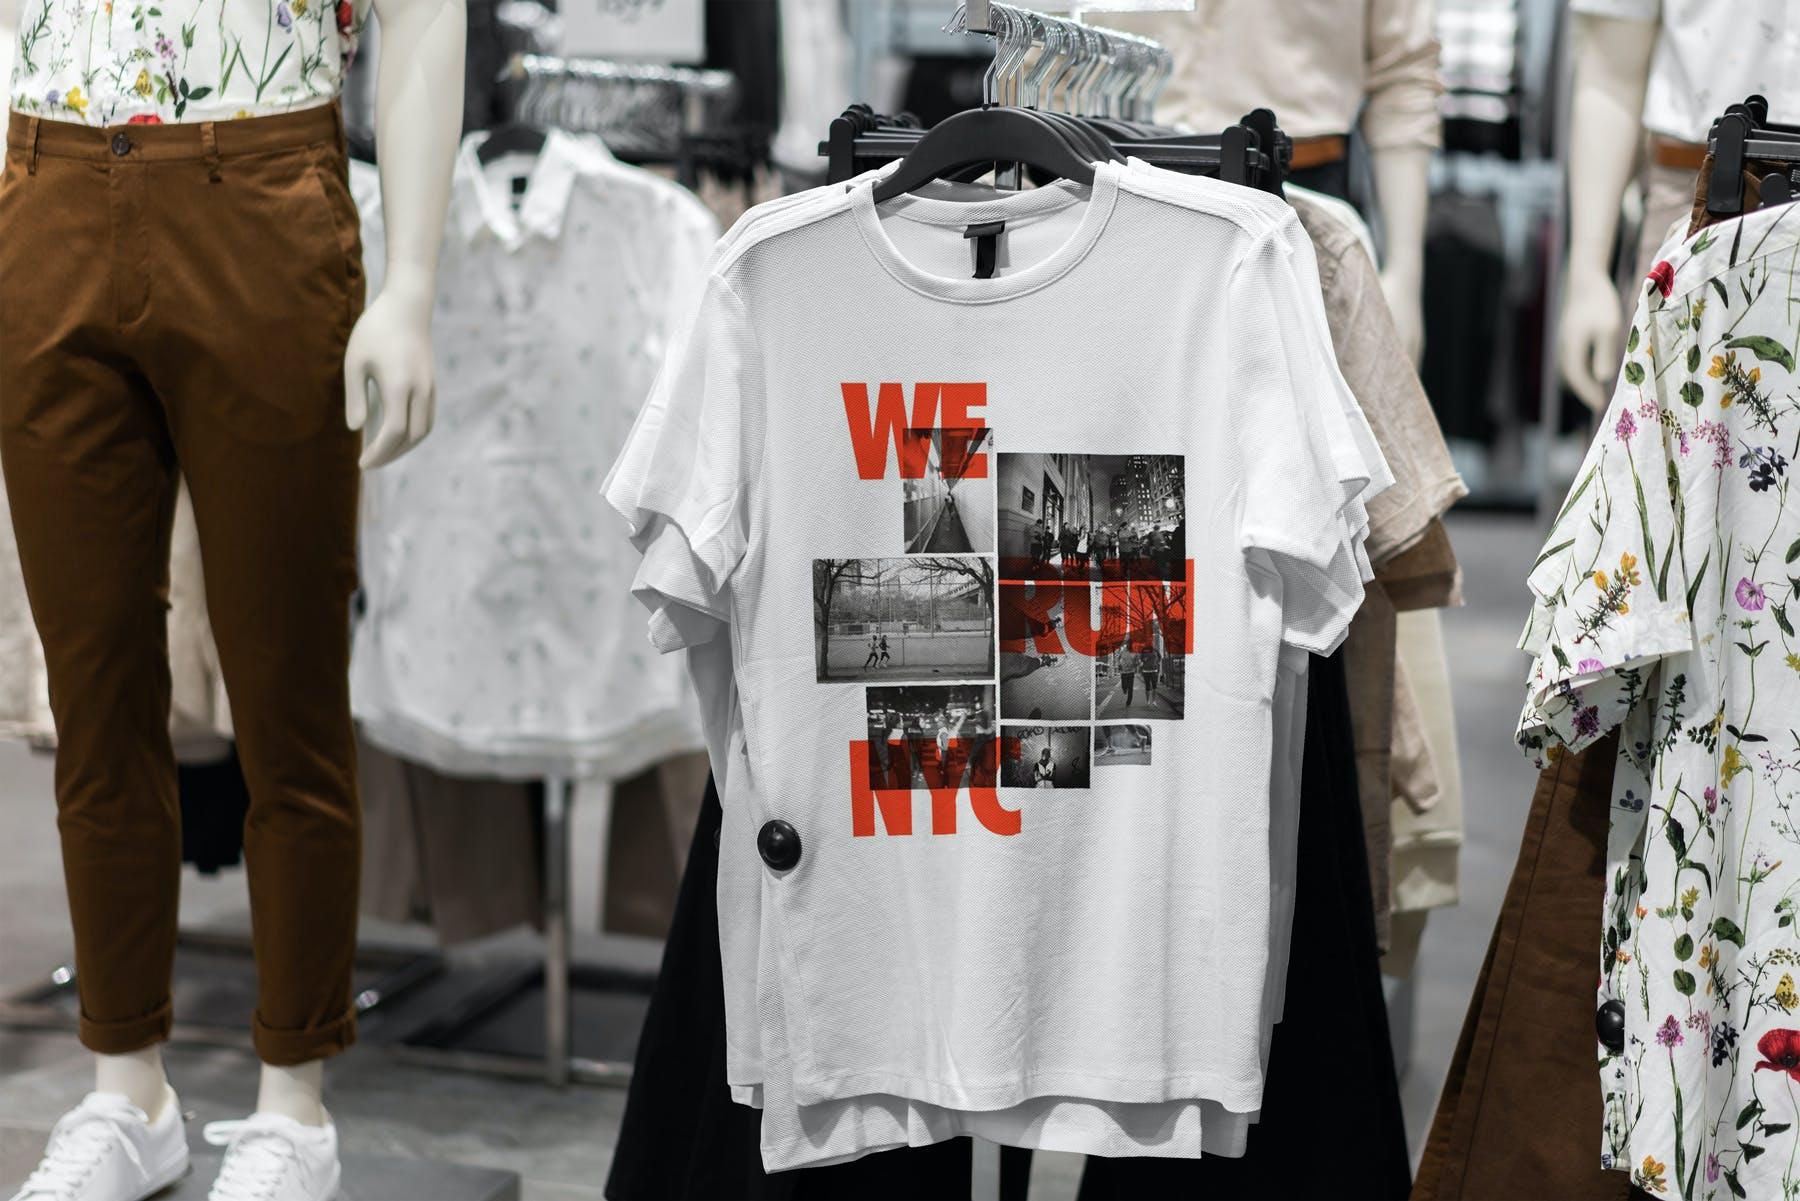 10款T恤半袖衫PSD样机模板 T-Shirt Shopping Mockup Vol.2插图(1)